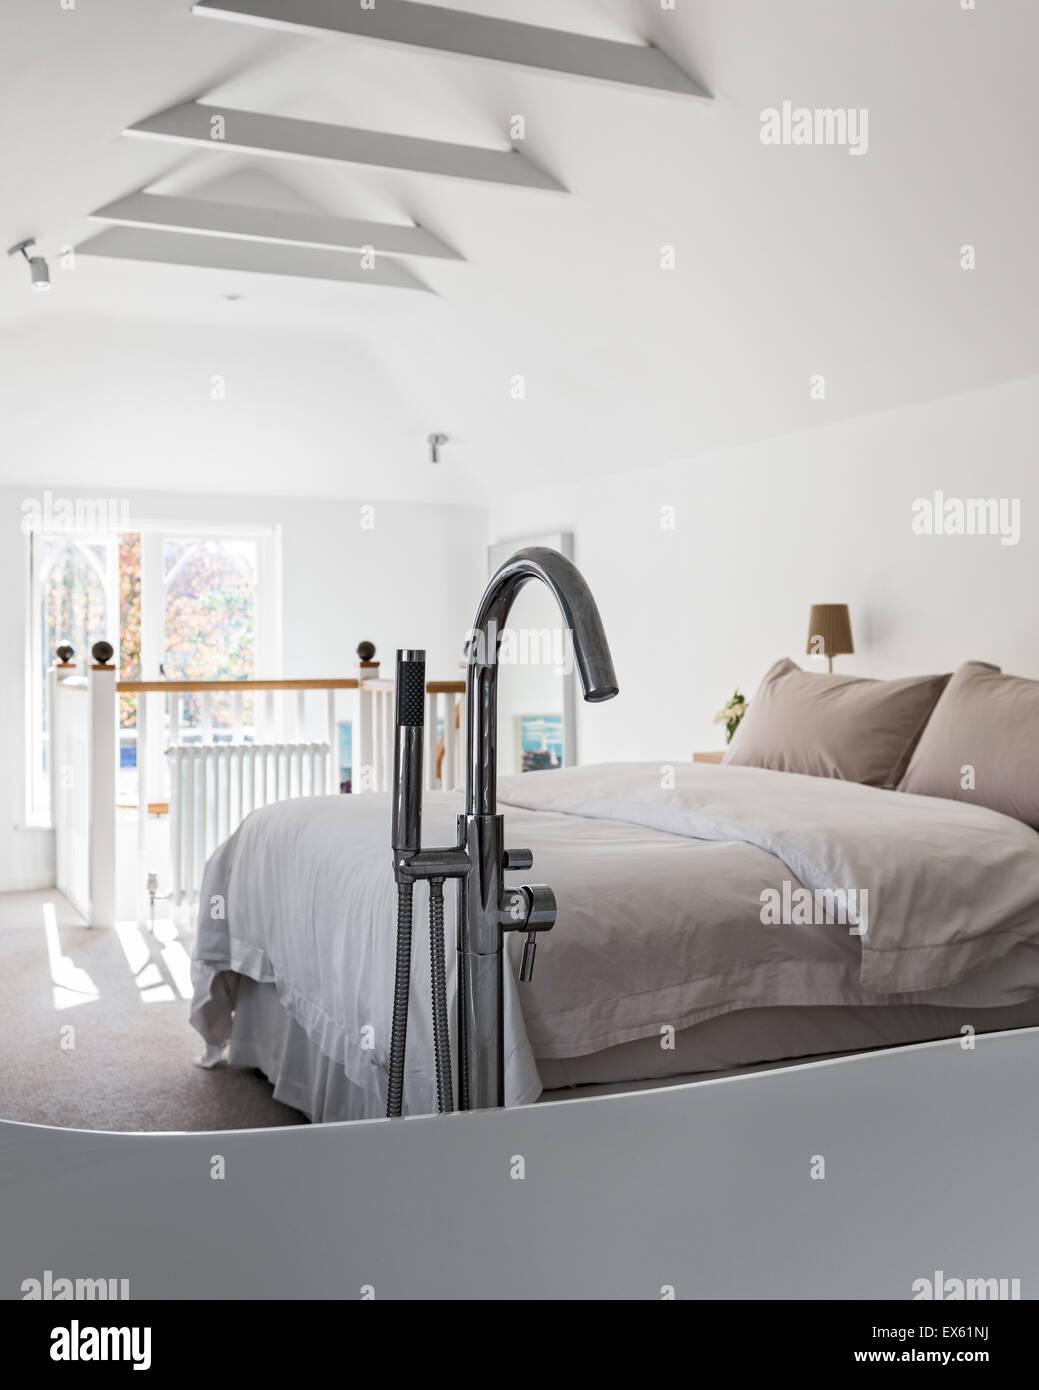 Cottage Style Bedroom Stockfotos & Cottage Style Bedroom Bilder - Alamy